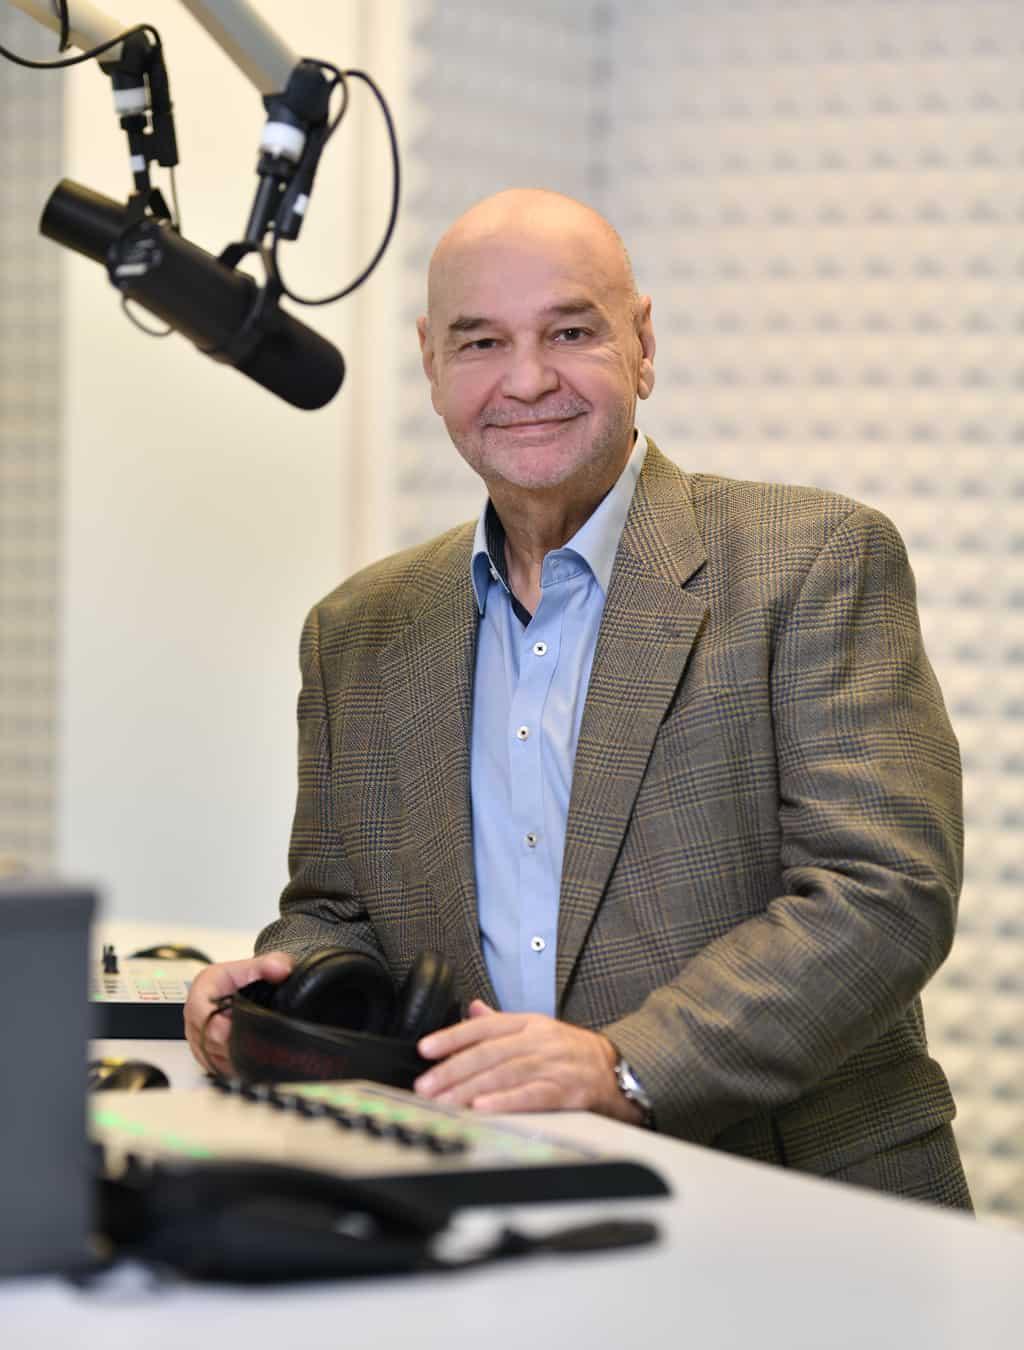 Thomas Göller am Mikrofon